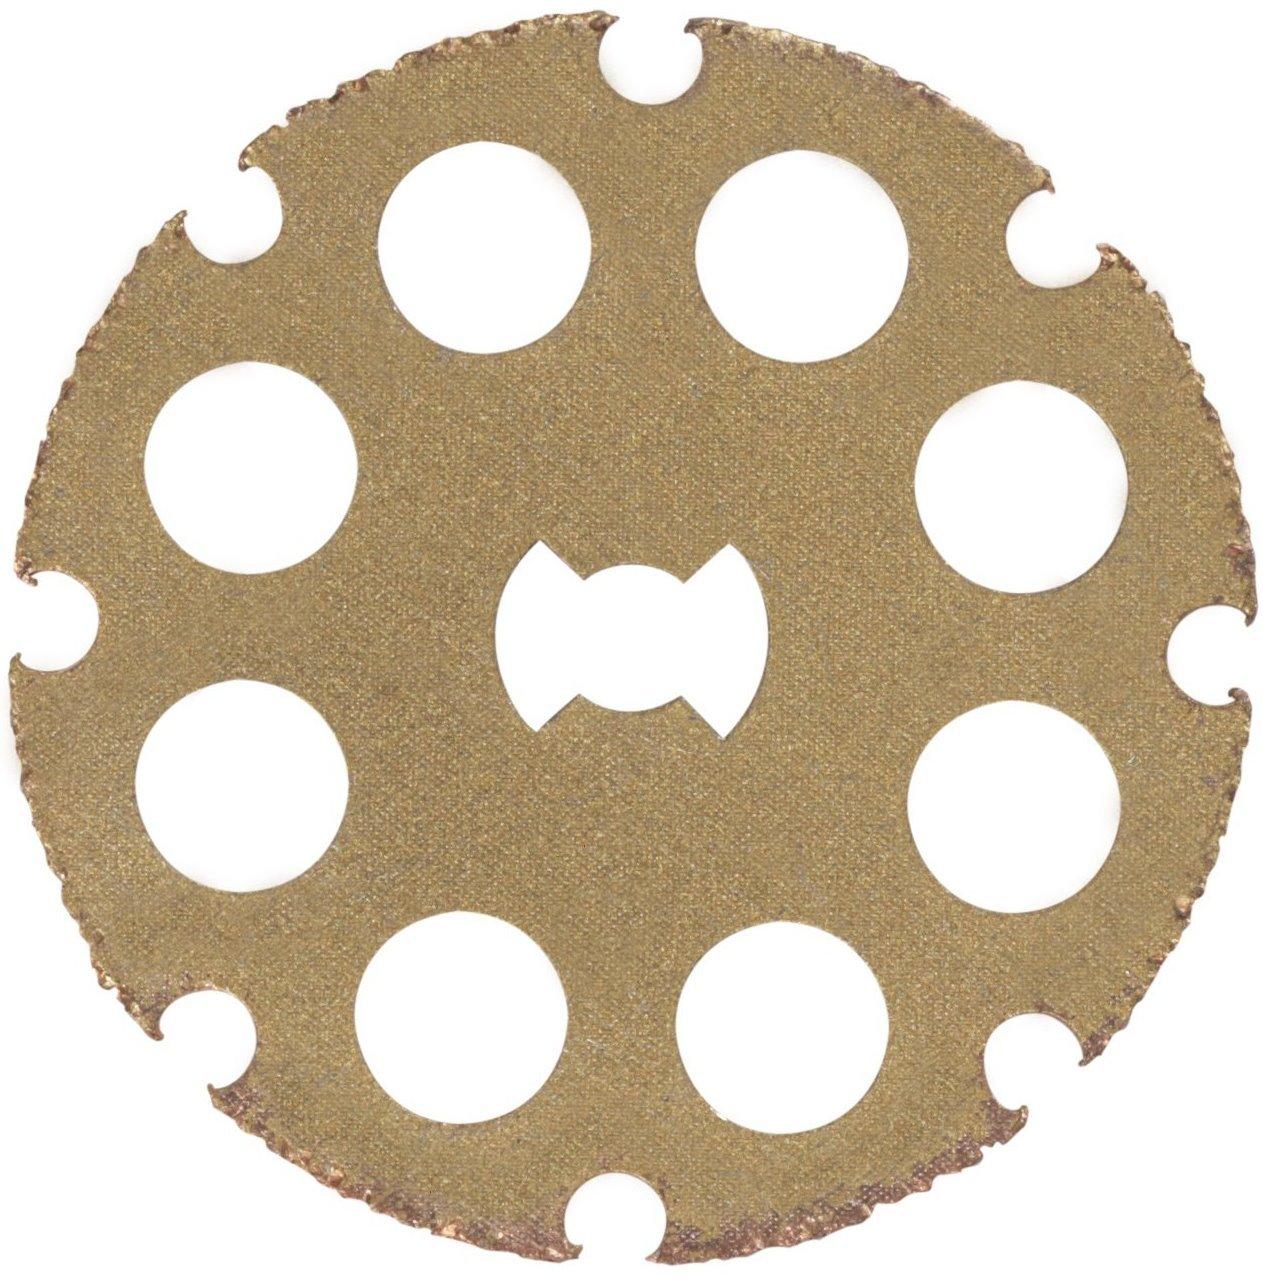 Dremel EZ544 1-1/2'' EZ Lock Cutting & Shaping Wheel